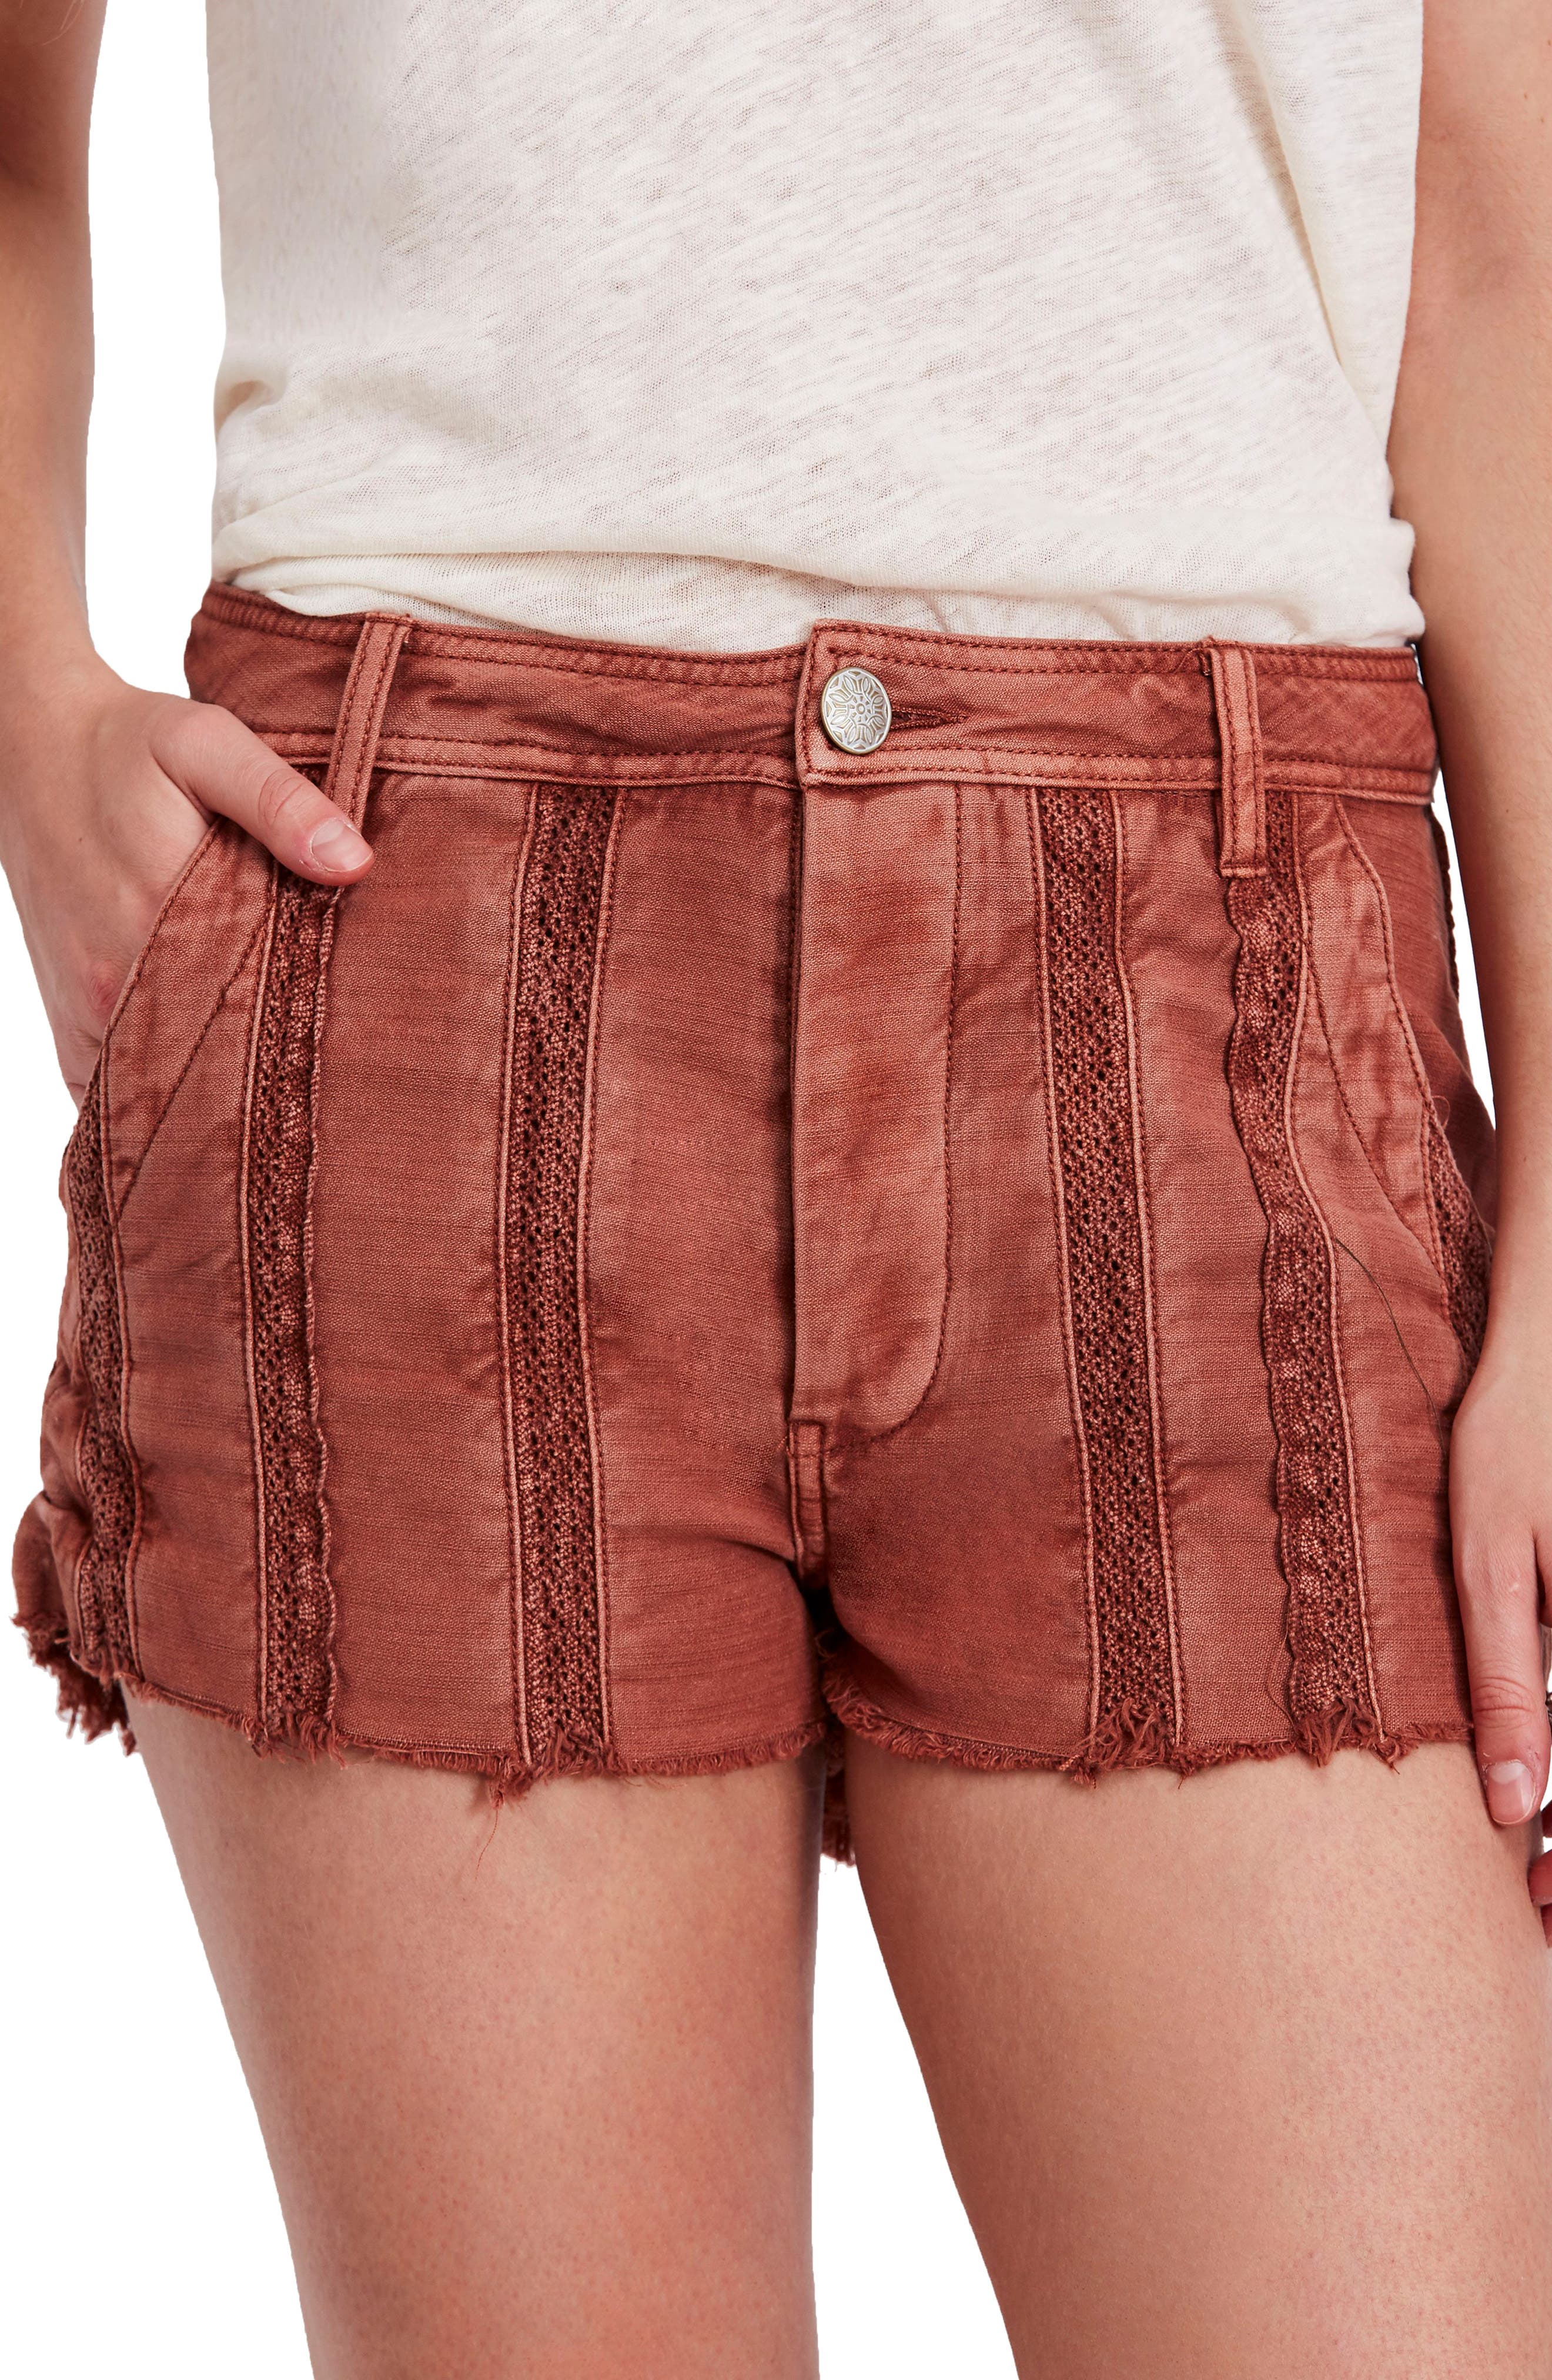 Great Expectations Lace Cutout Shorts,                             Main thumbnail 1, color,                             Peach